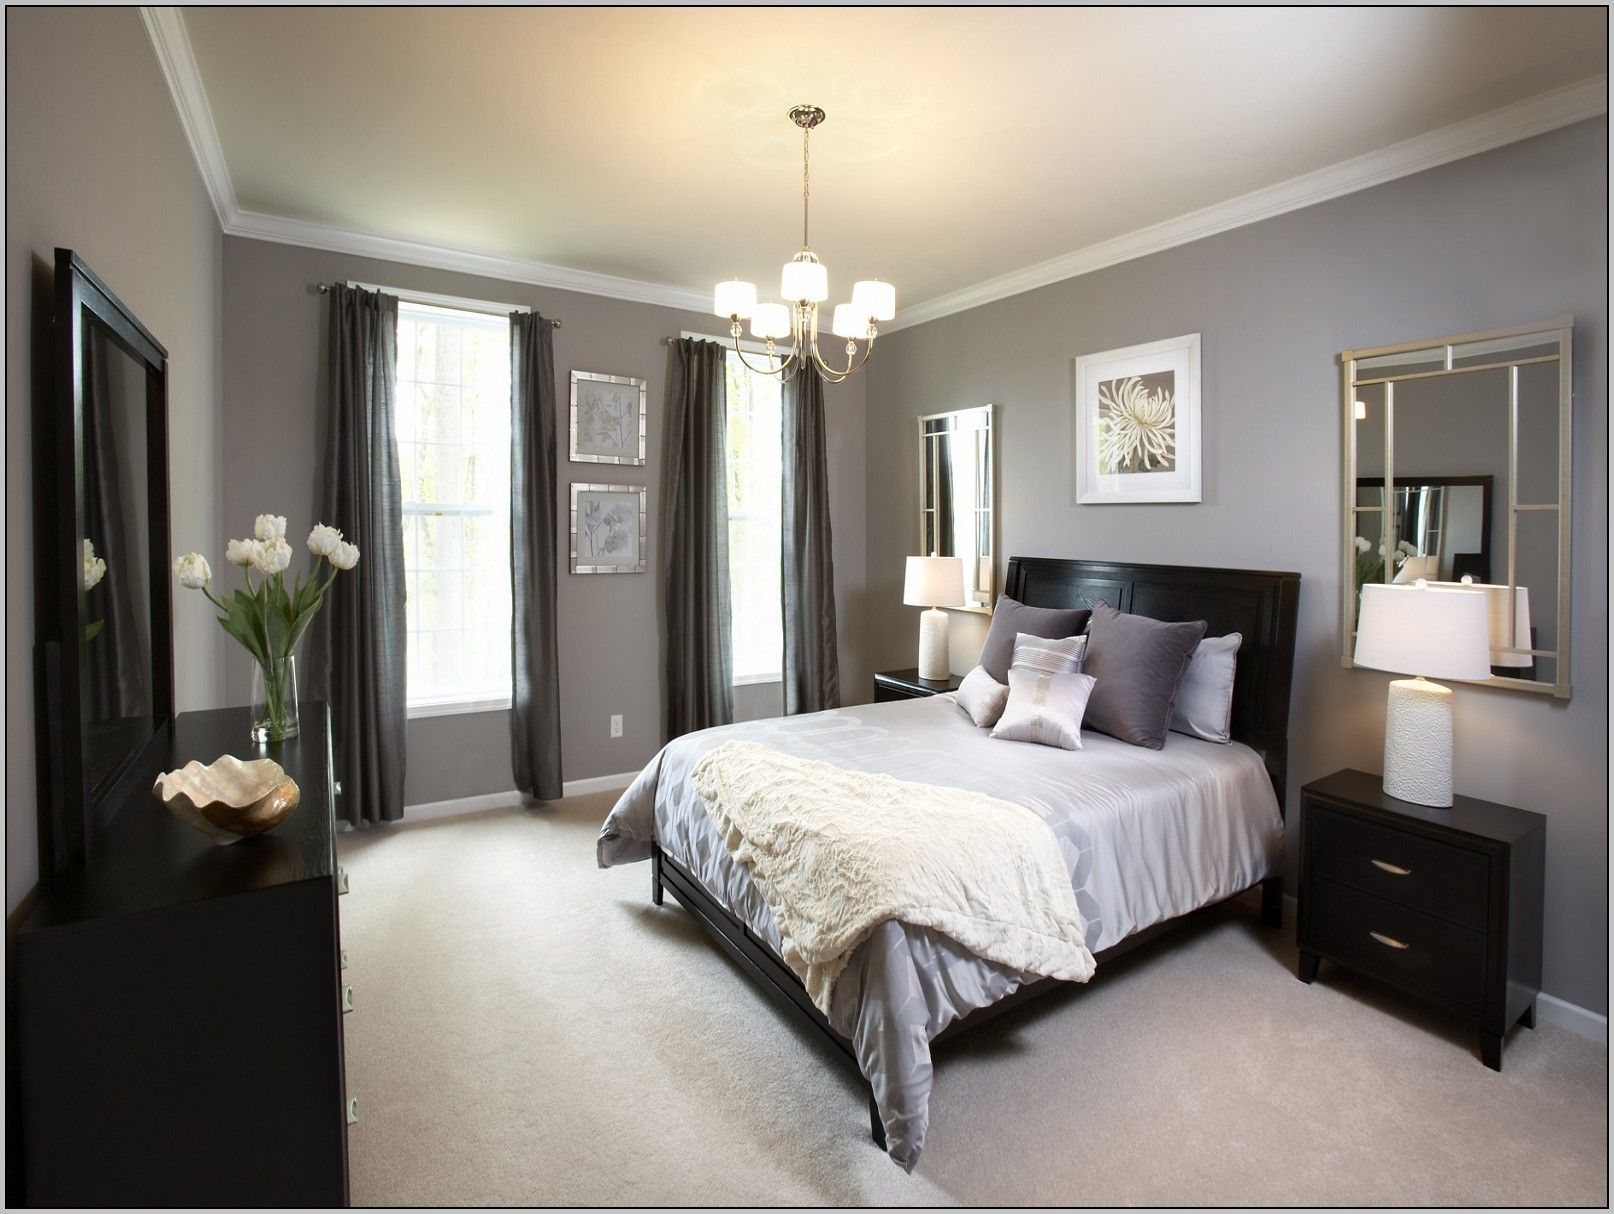 black bedroom furniture. Perfect Furniture Grey Paint Color For Master Bedroom And Black Furniture